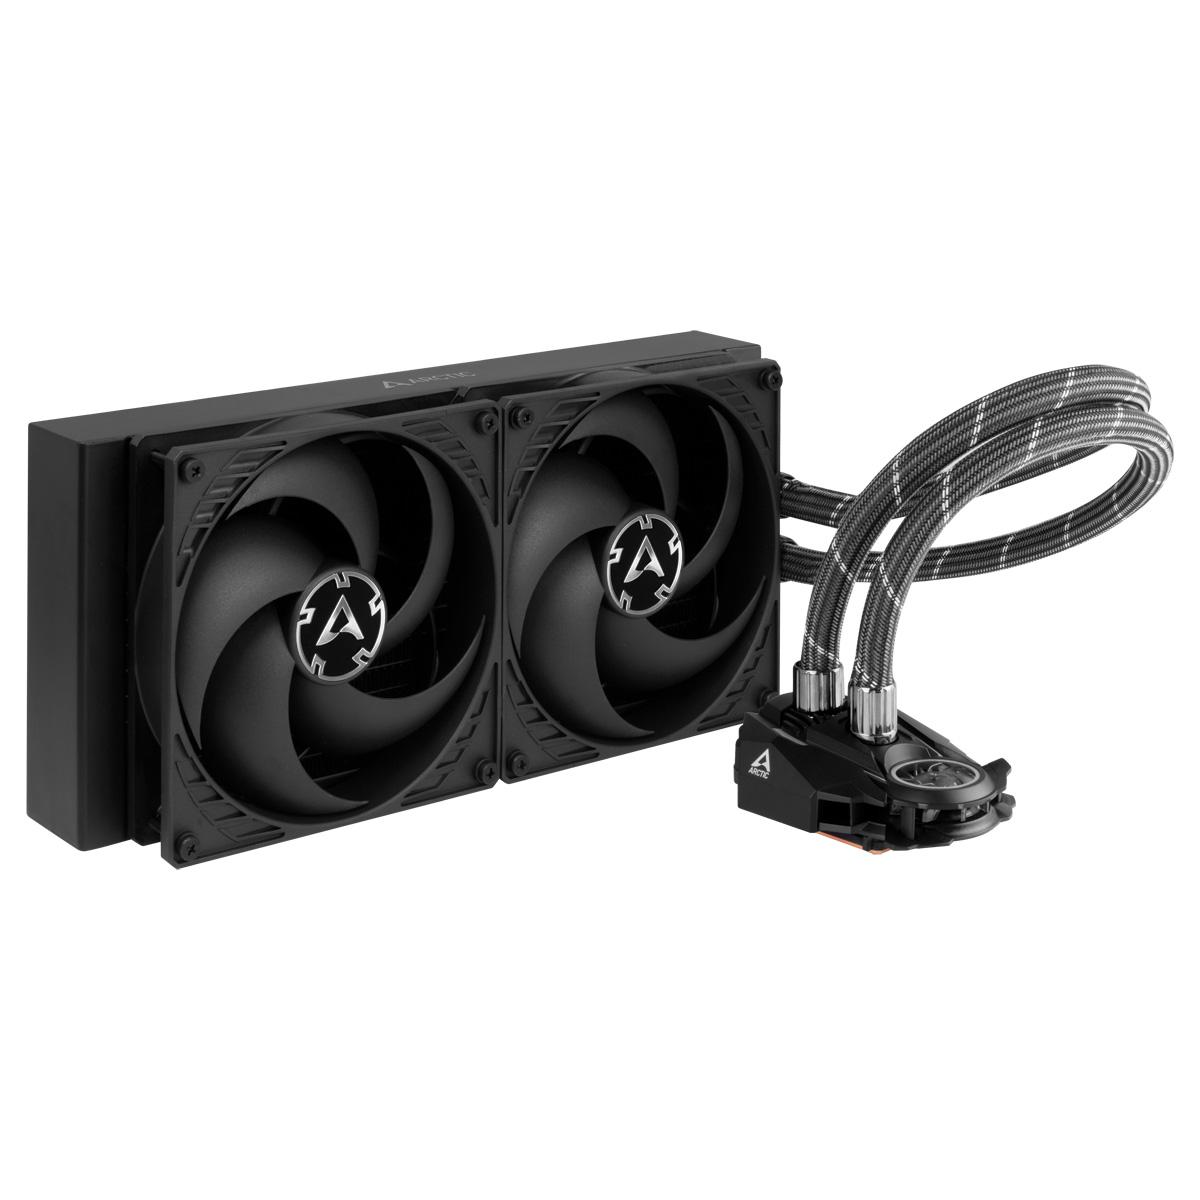 Multi-Compatible AiO CPU Water Cooler ARCTIC Liquid Freezer II 280